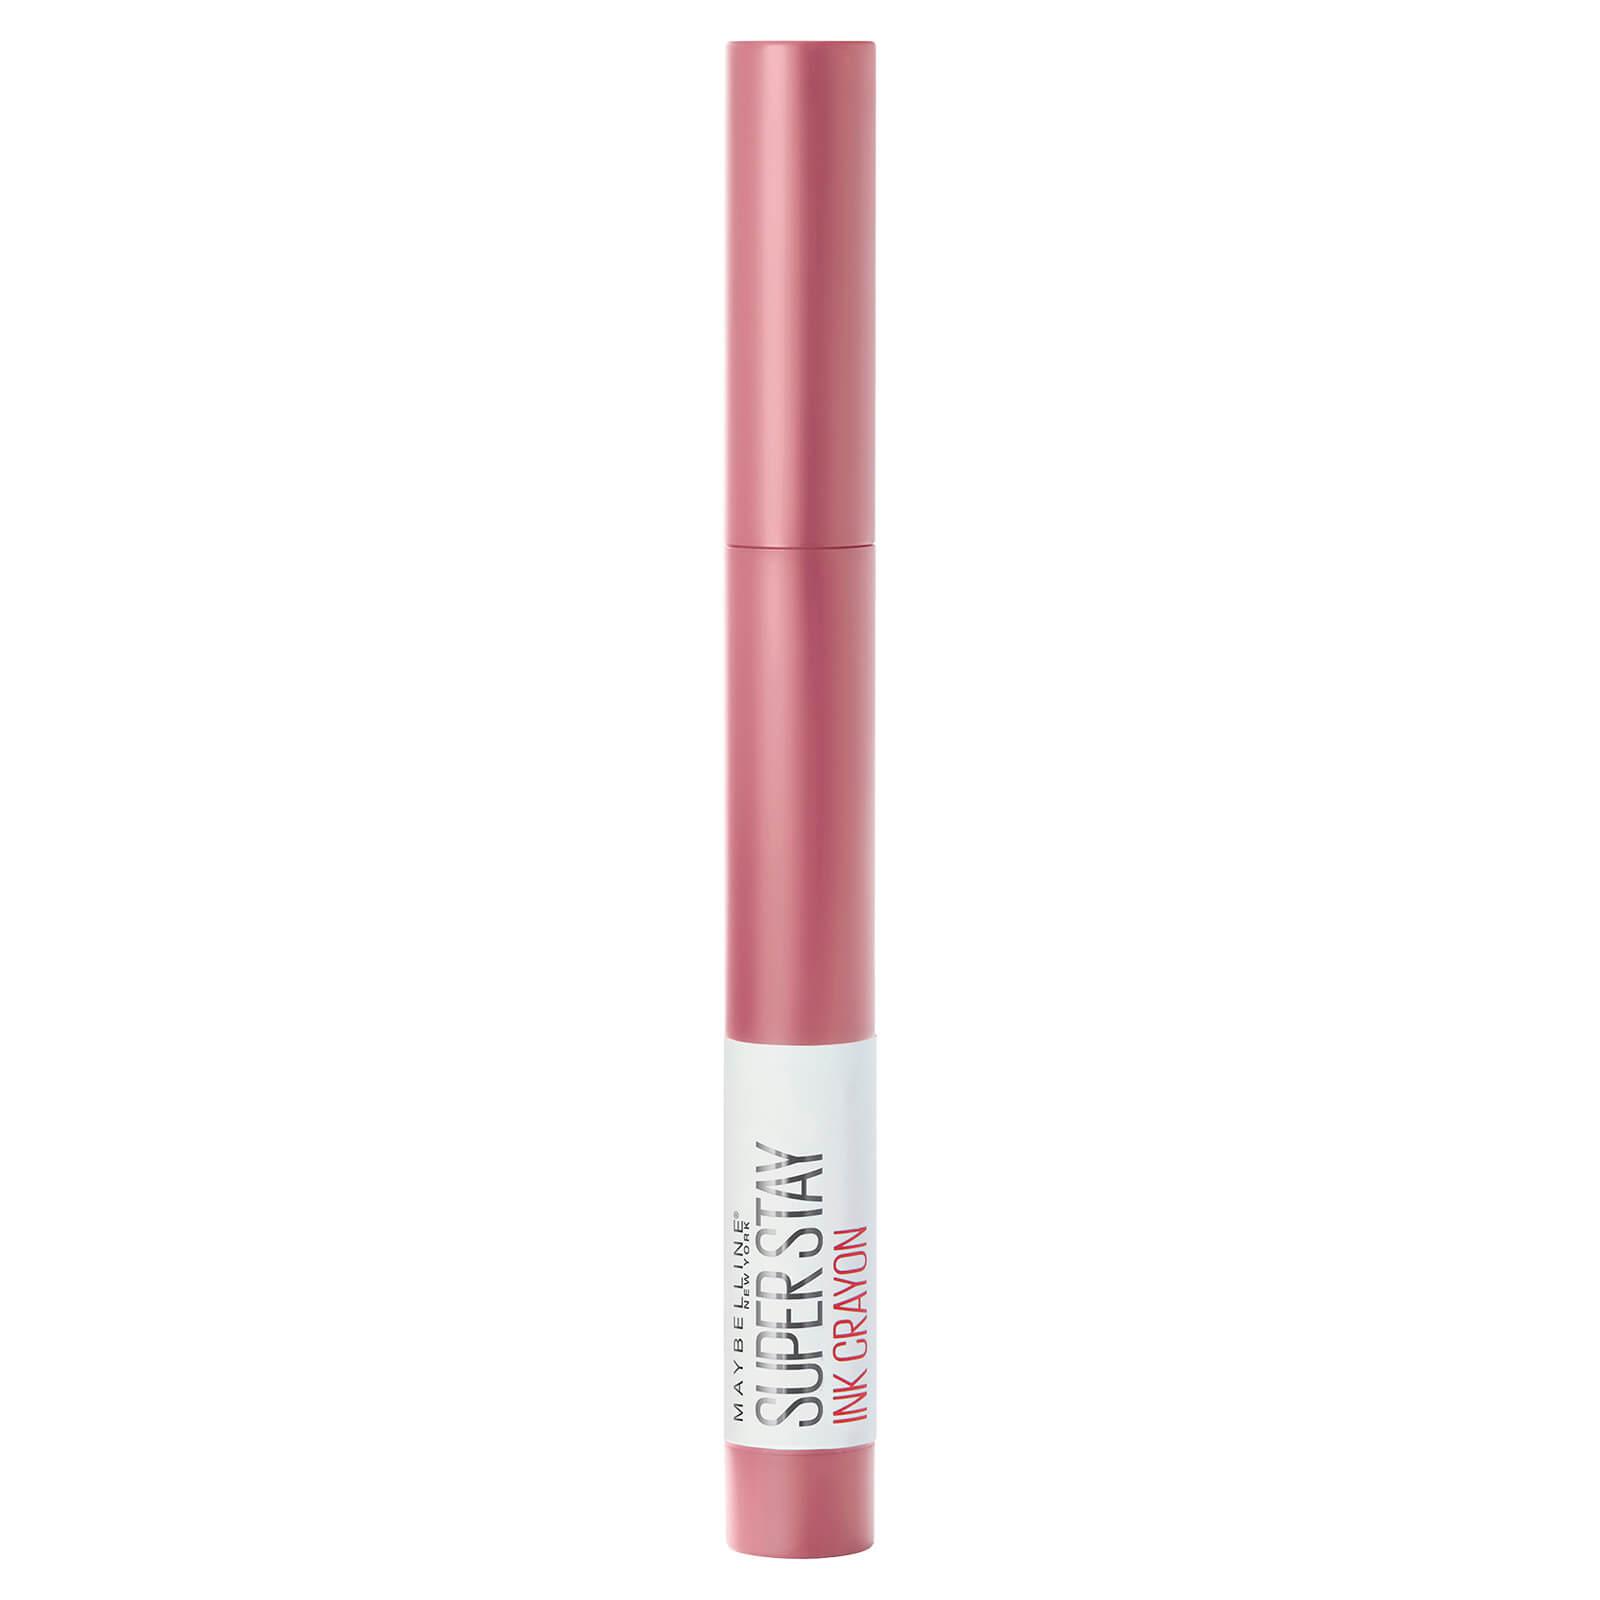 Купить Maybelline Superstay Matte Ink Crayon Lipstick 32g (Various Shades) - 30 Seek Adventure